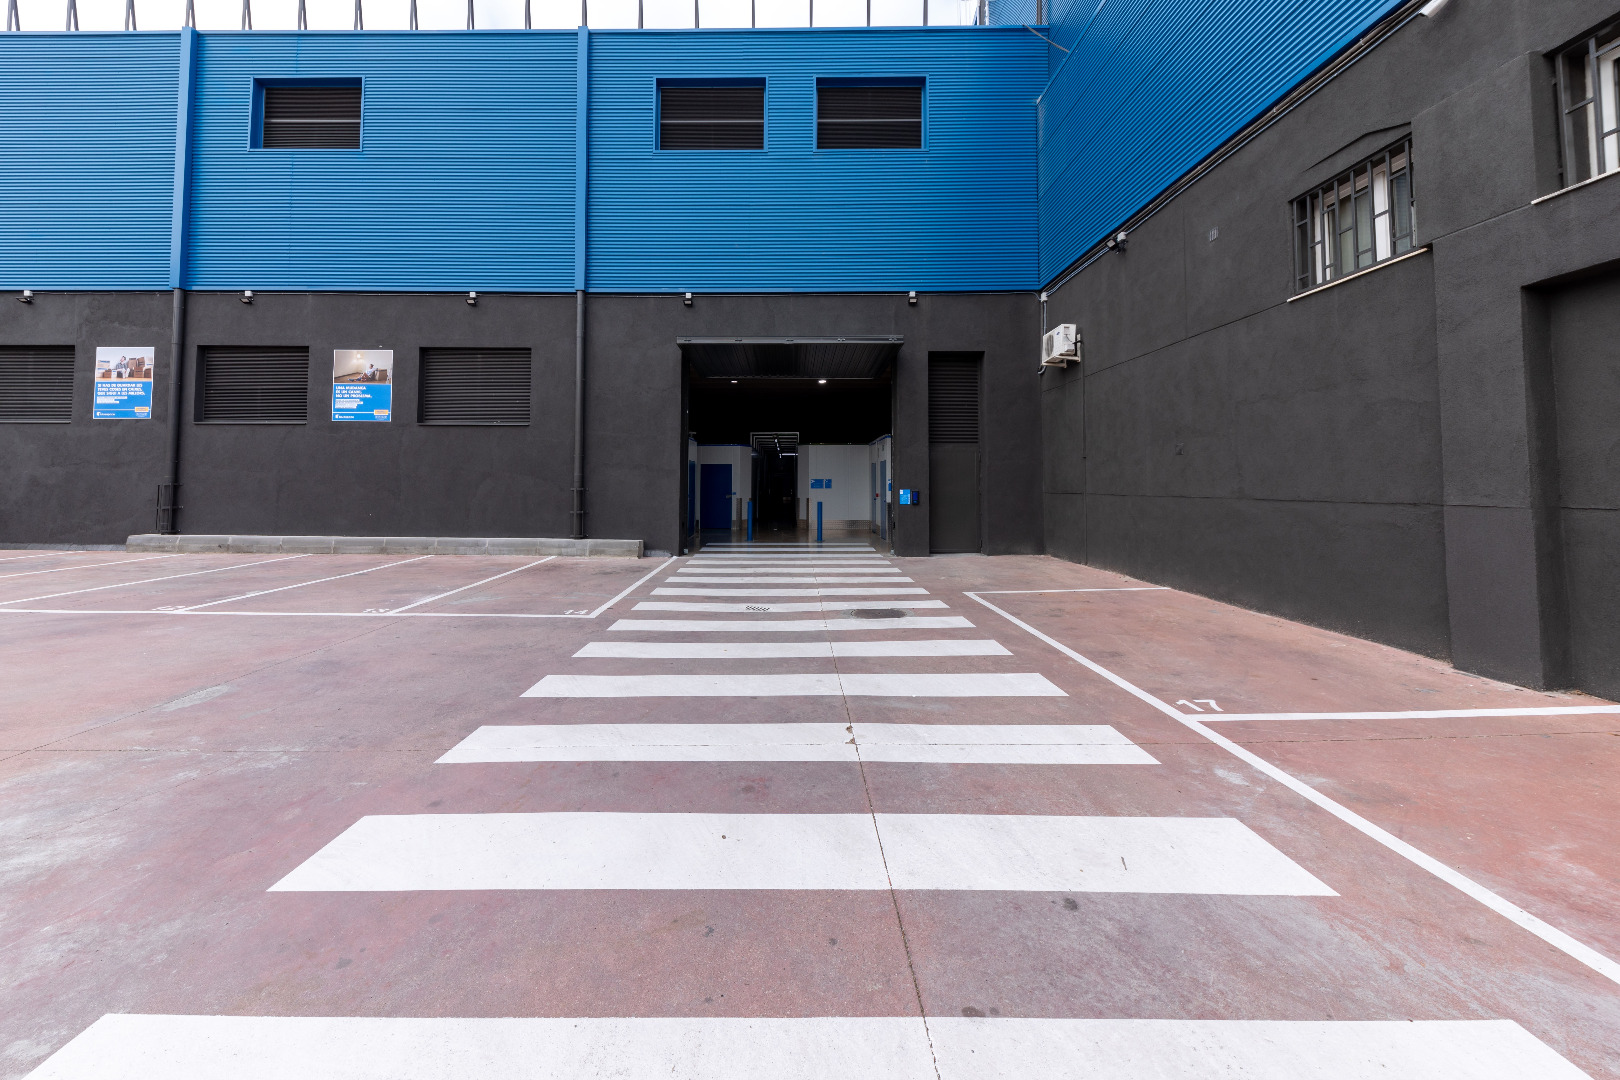 Location Entrepôt  Carrer del rosselló, 2. ¡primer mes por 1€! trasteros bluespace en terrassa